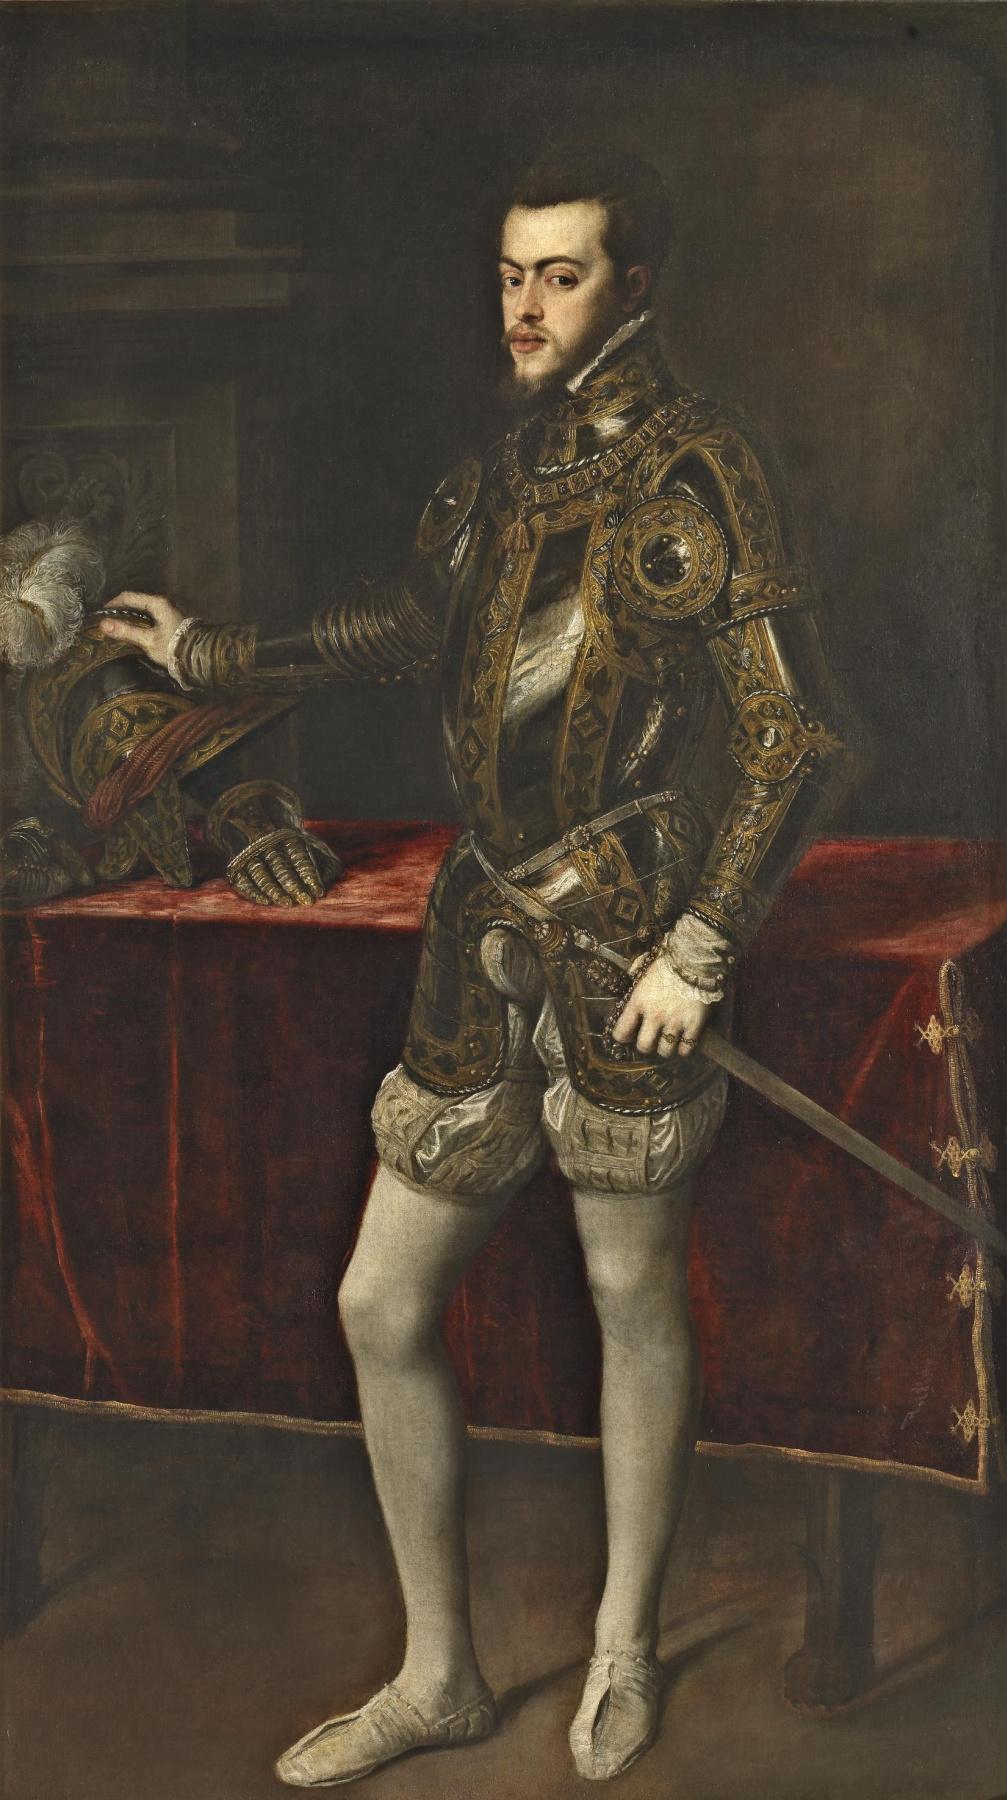 Titian Vecelli. Portrait of Philip II in armor